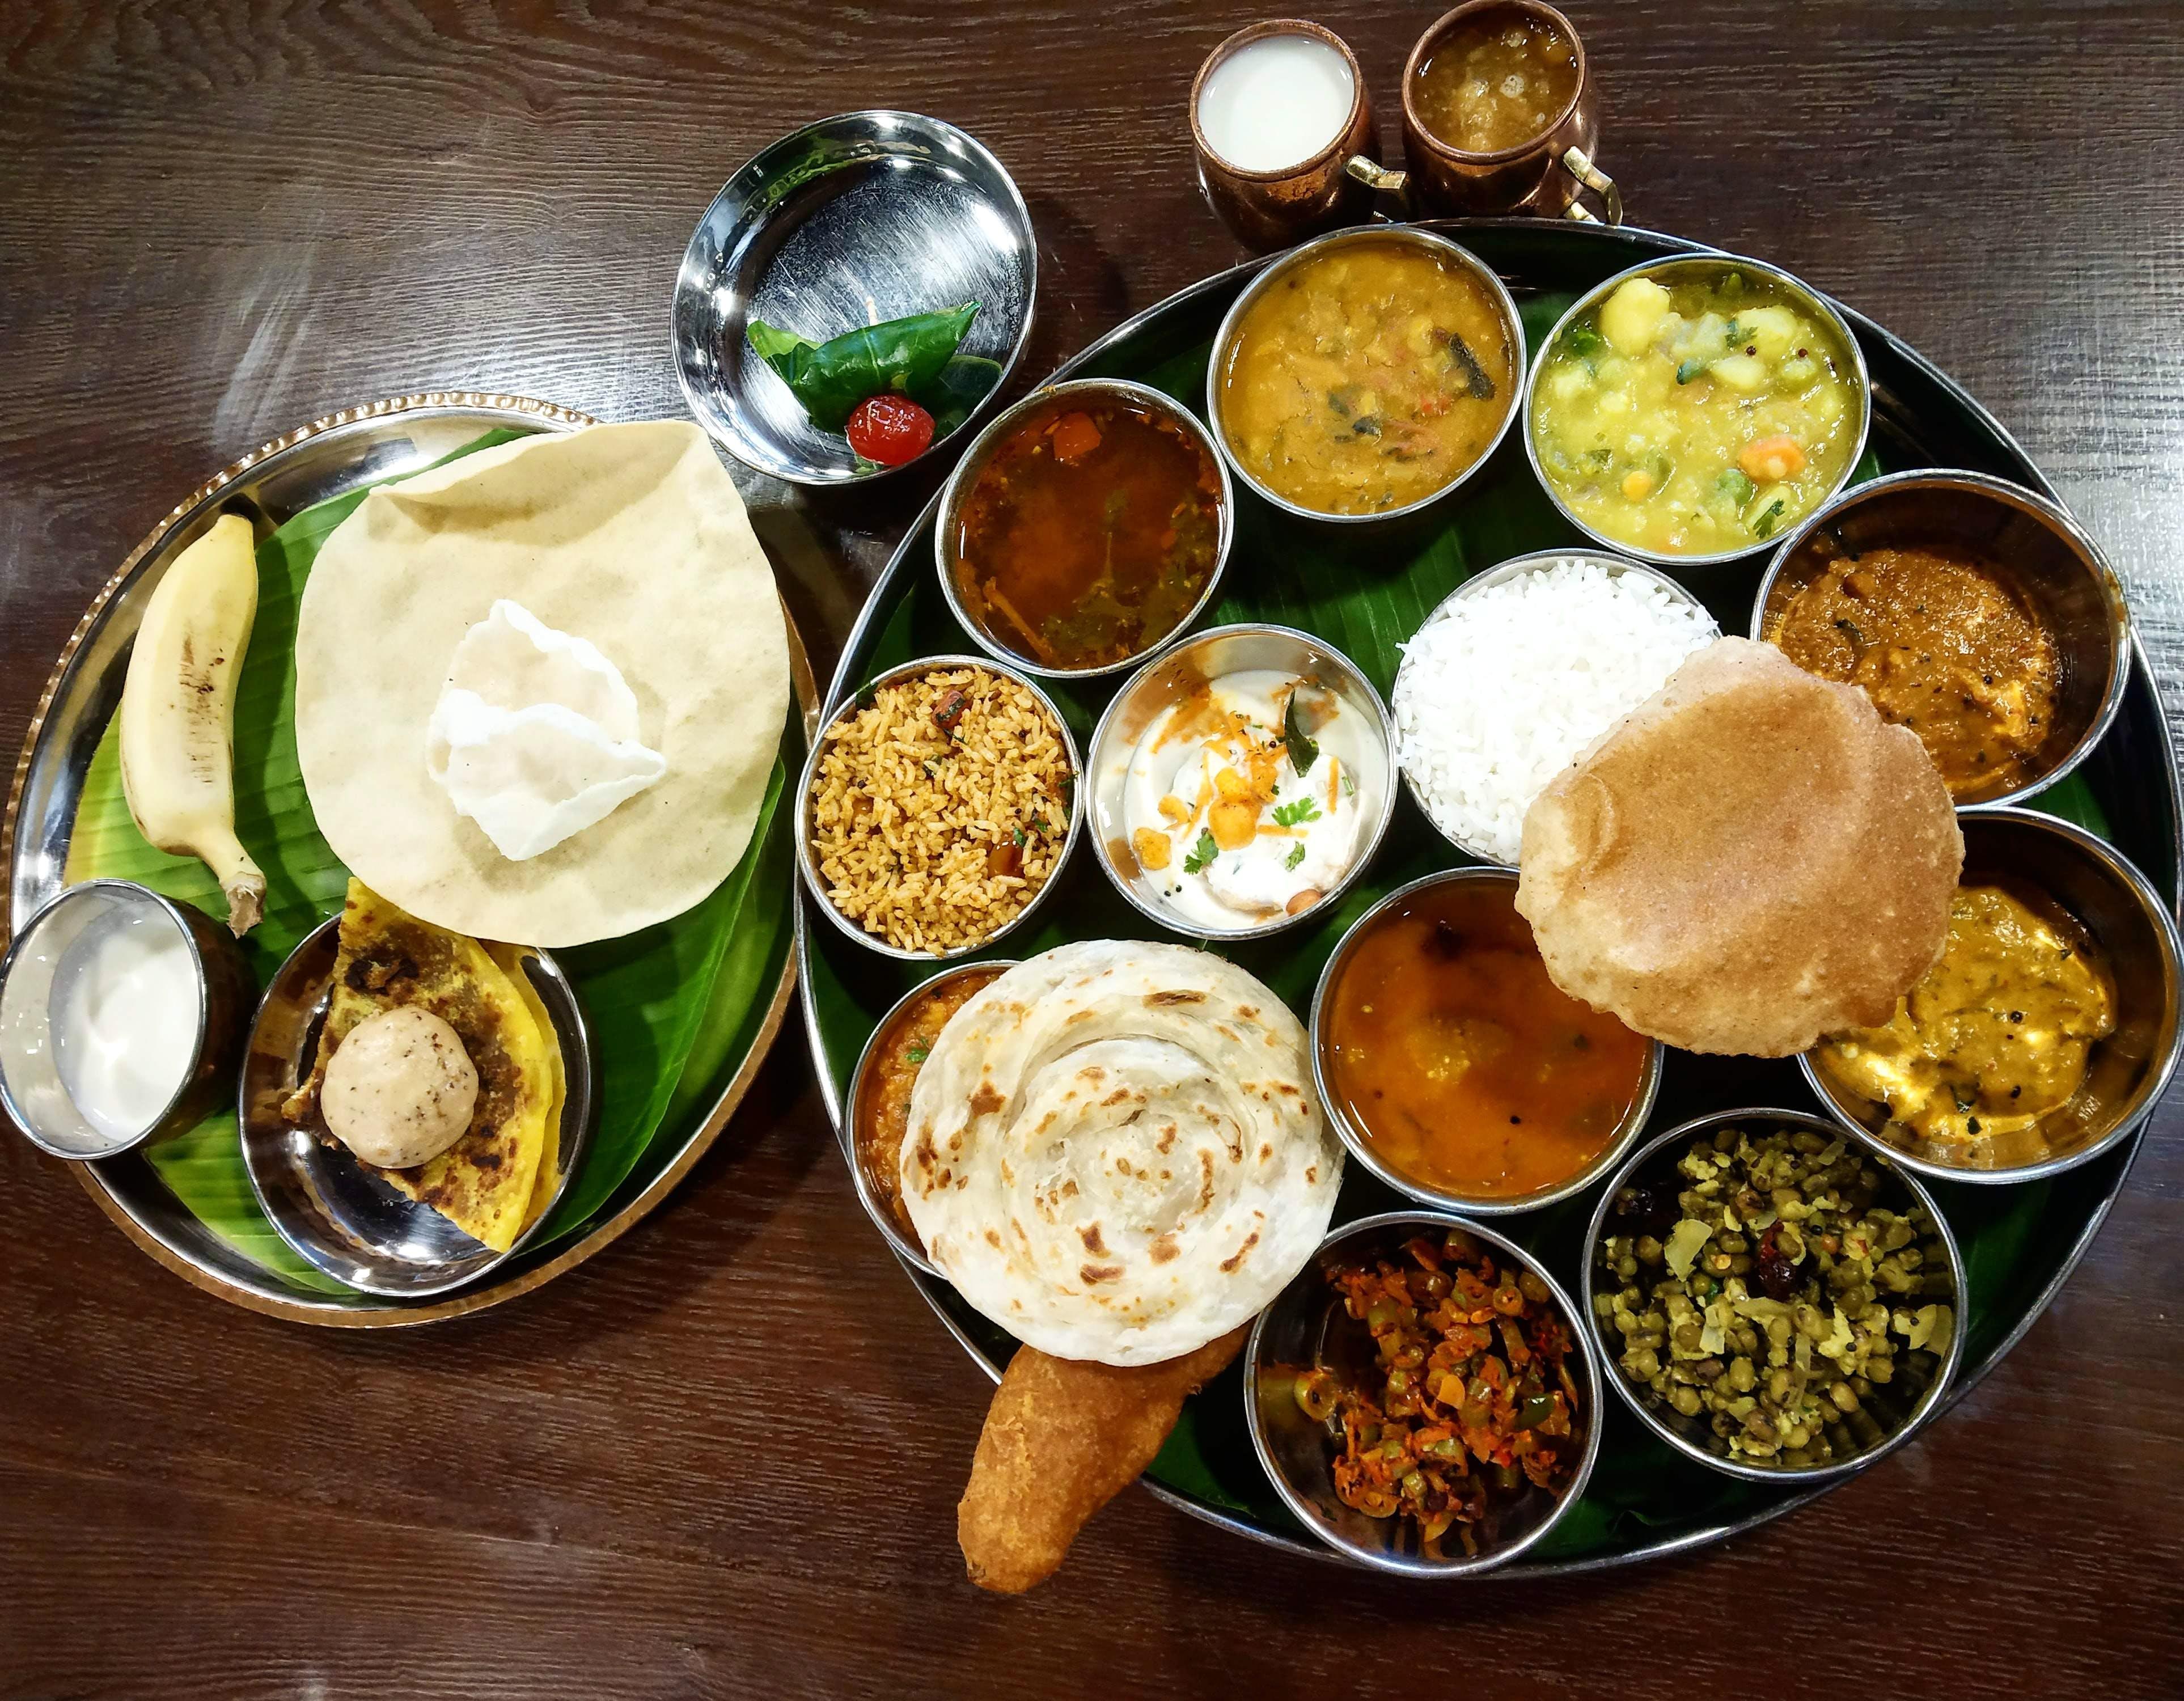 Dish,Food,Cuisine,Meal,Ingredient,Lunch,Indian cuisine,Andhra food,Vegetarian food,Tamil food